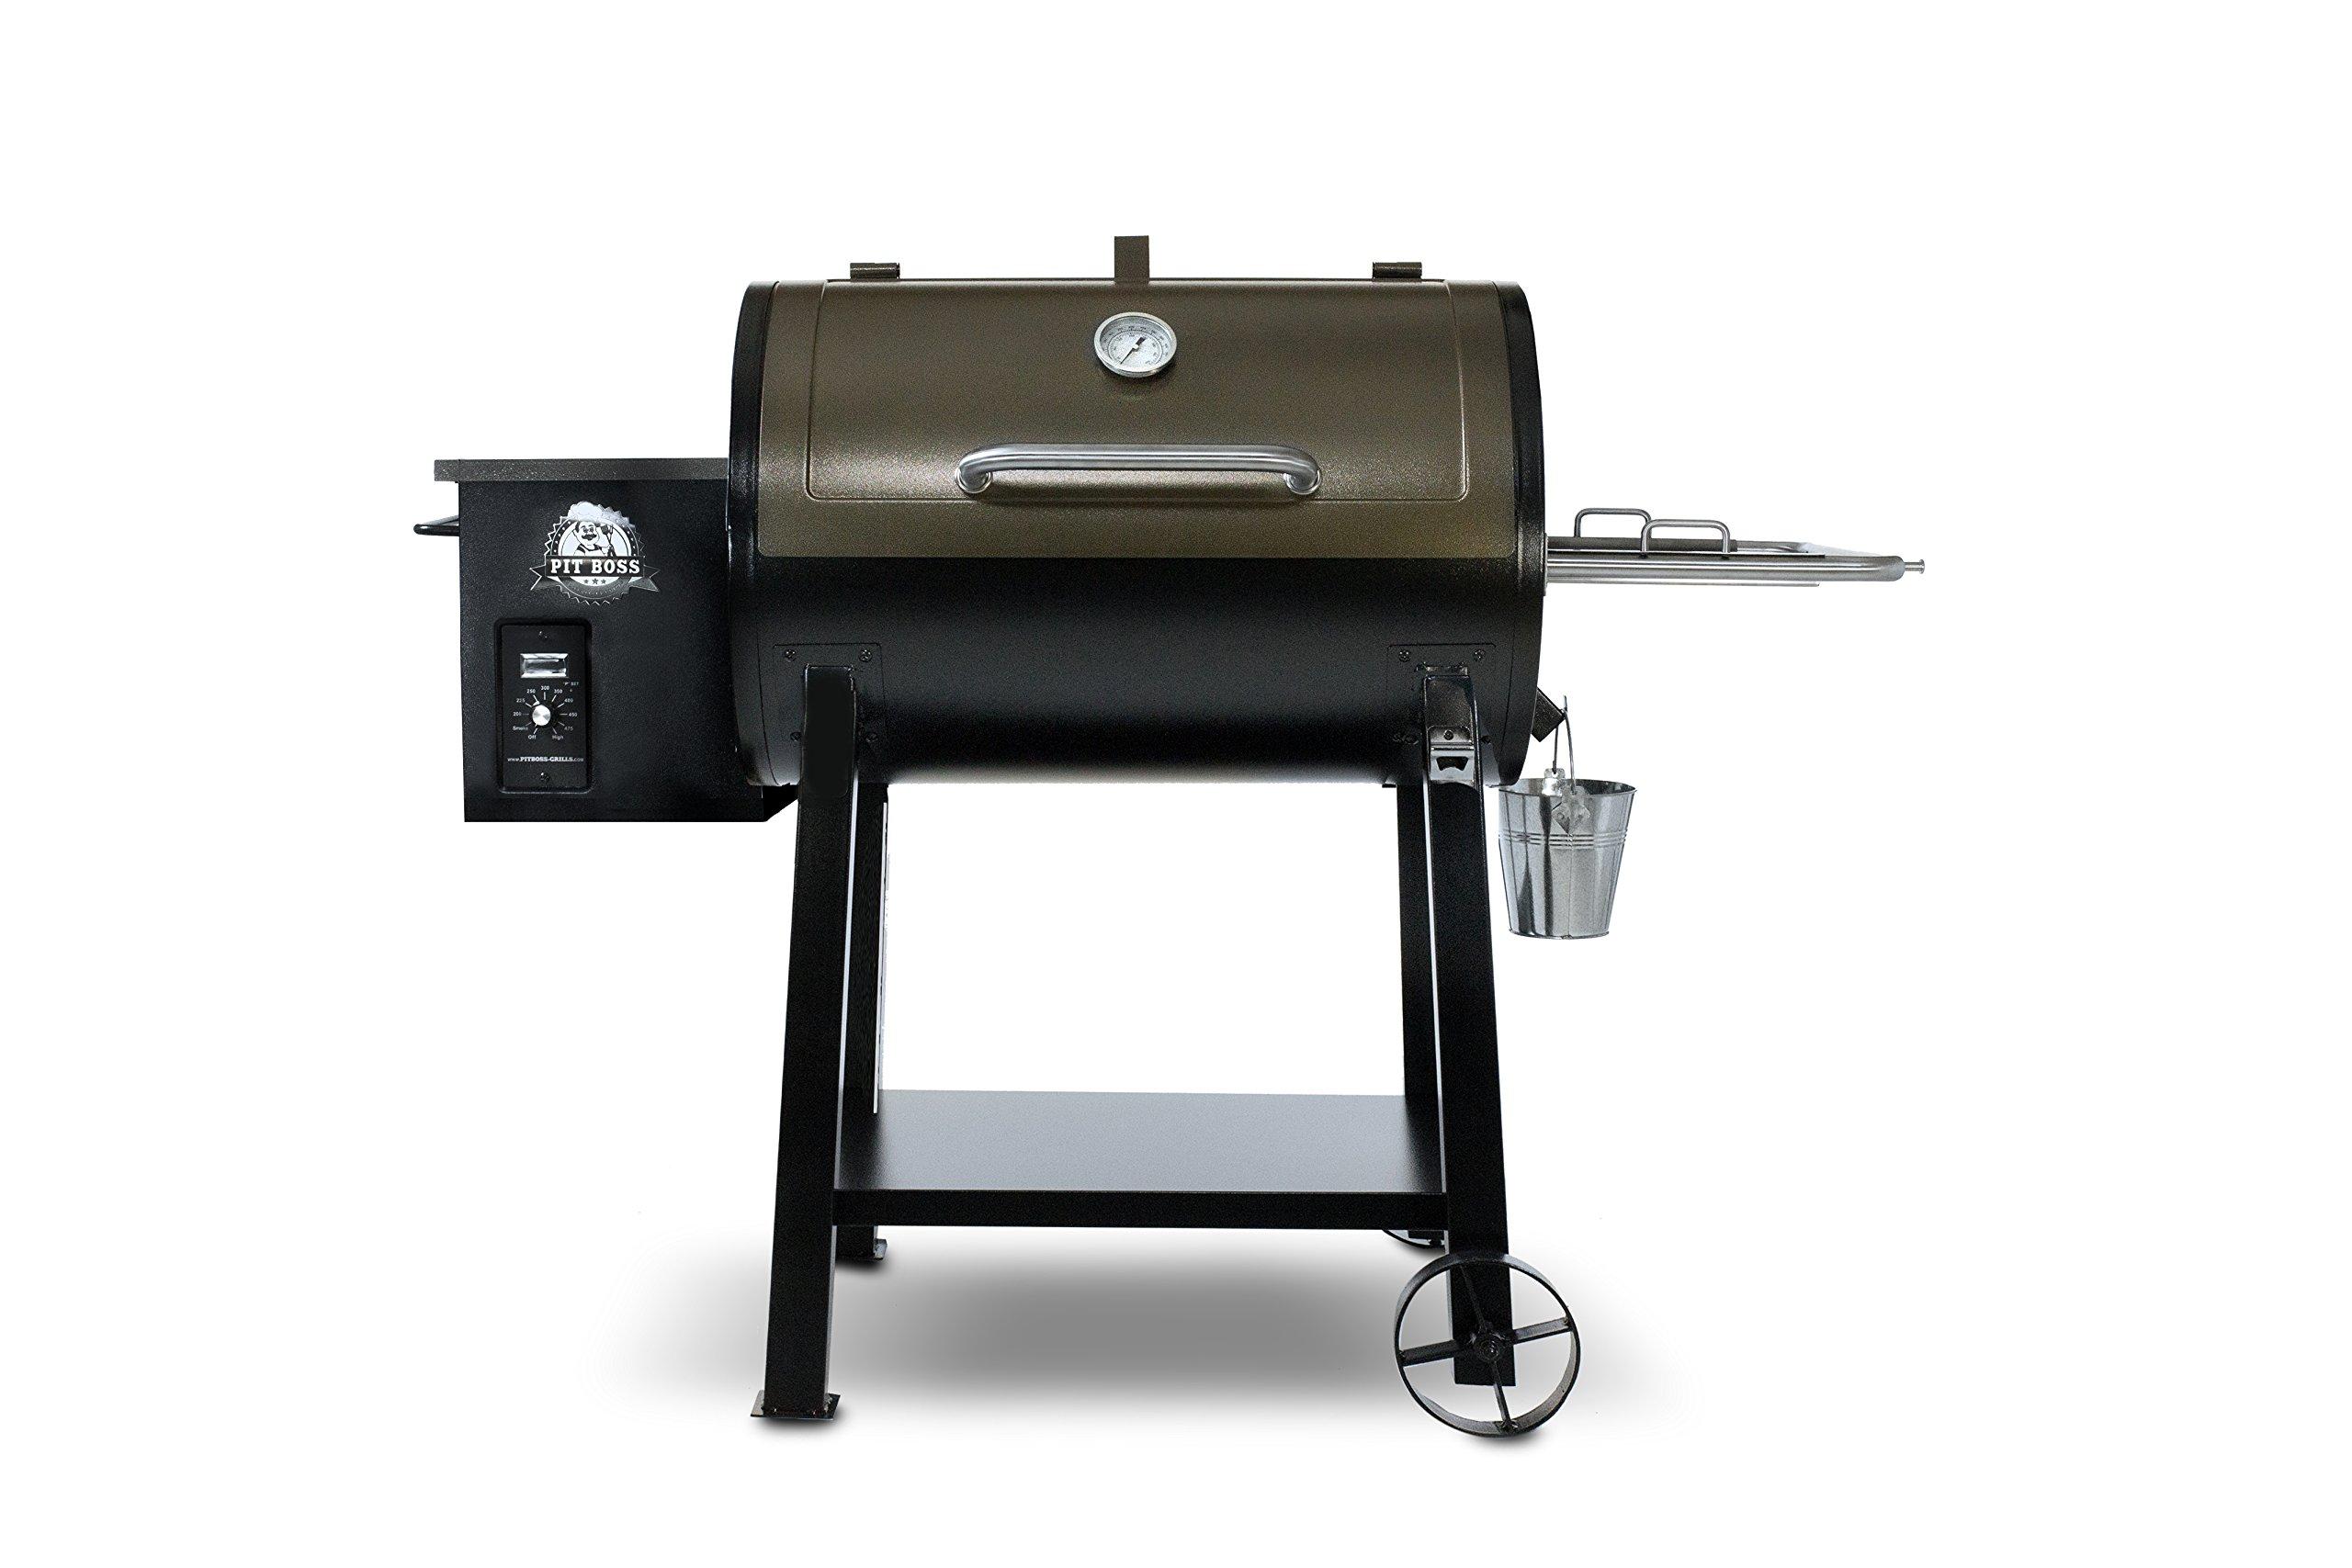 pit boss grills 440 deluxe wood pellet grill ebay